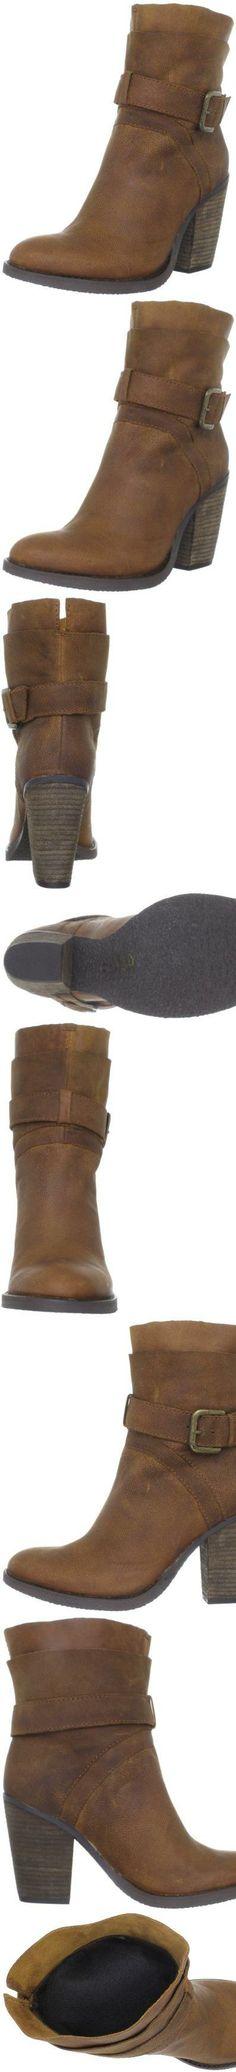 Dropped 12% on Jan 9. Steven by Steve Madden Riskey Boot, Cognac Leather